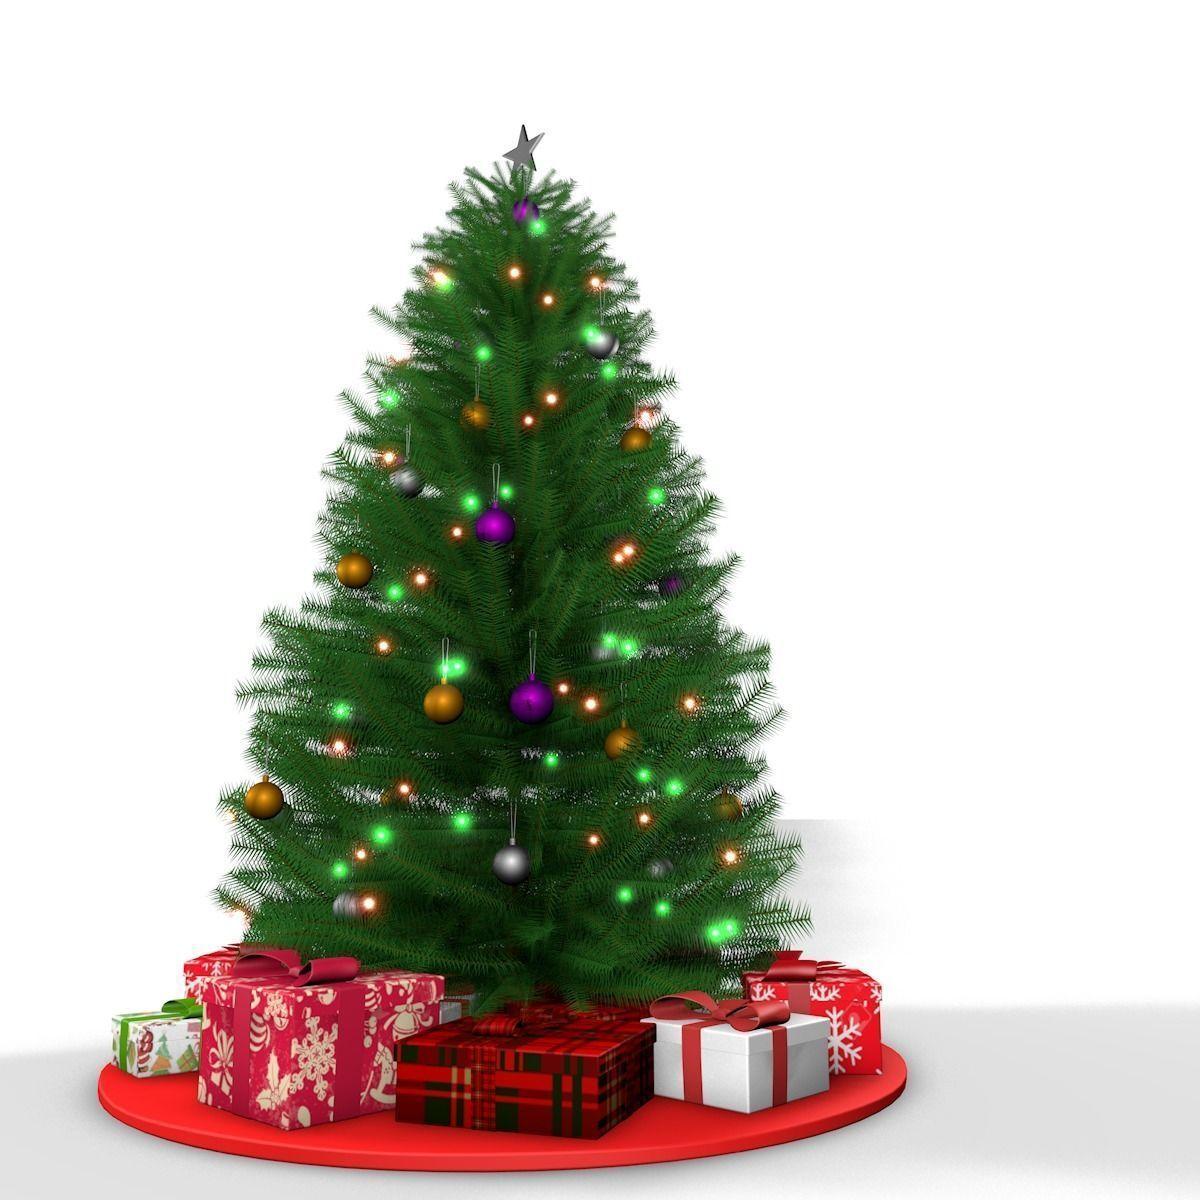 Christmas Tree 3d Model In 2020 Christmas Tree 3d Model Christmas Tree Christmas Tree Decorations